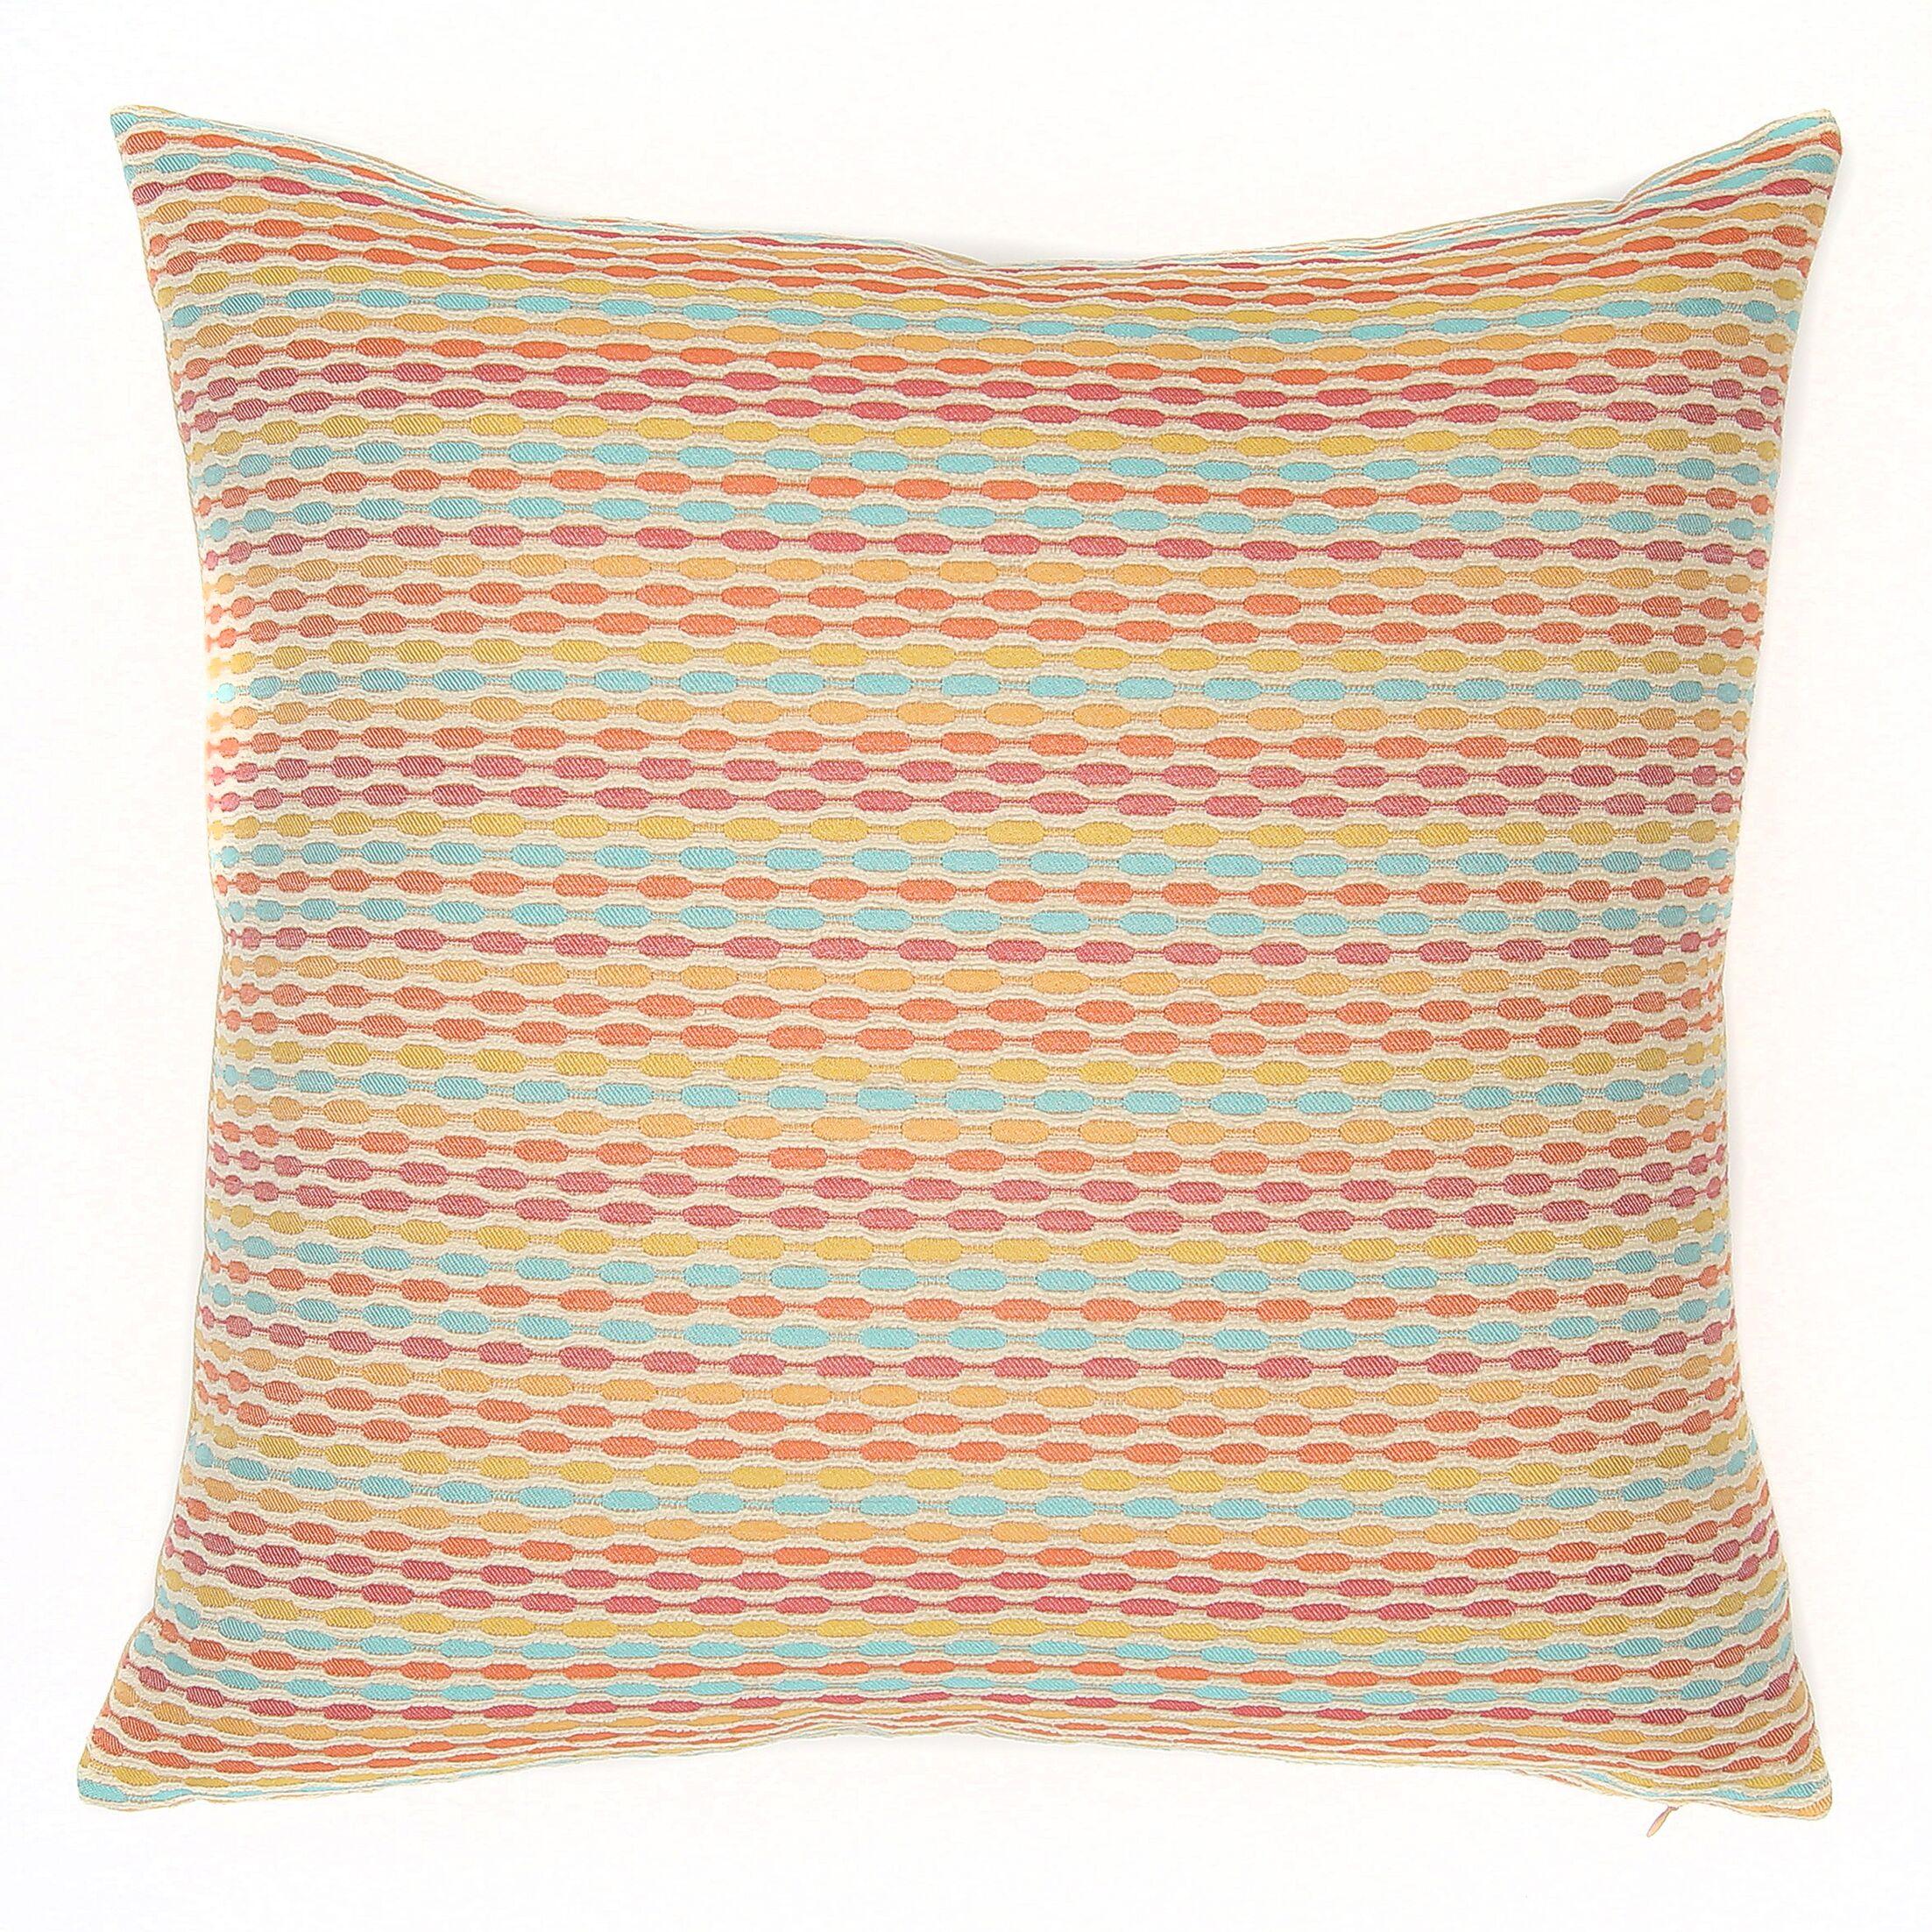 Marbella Confetti Throw Pillow